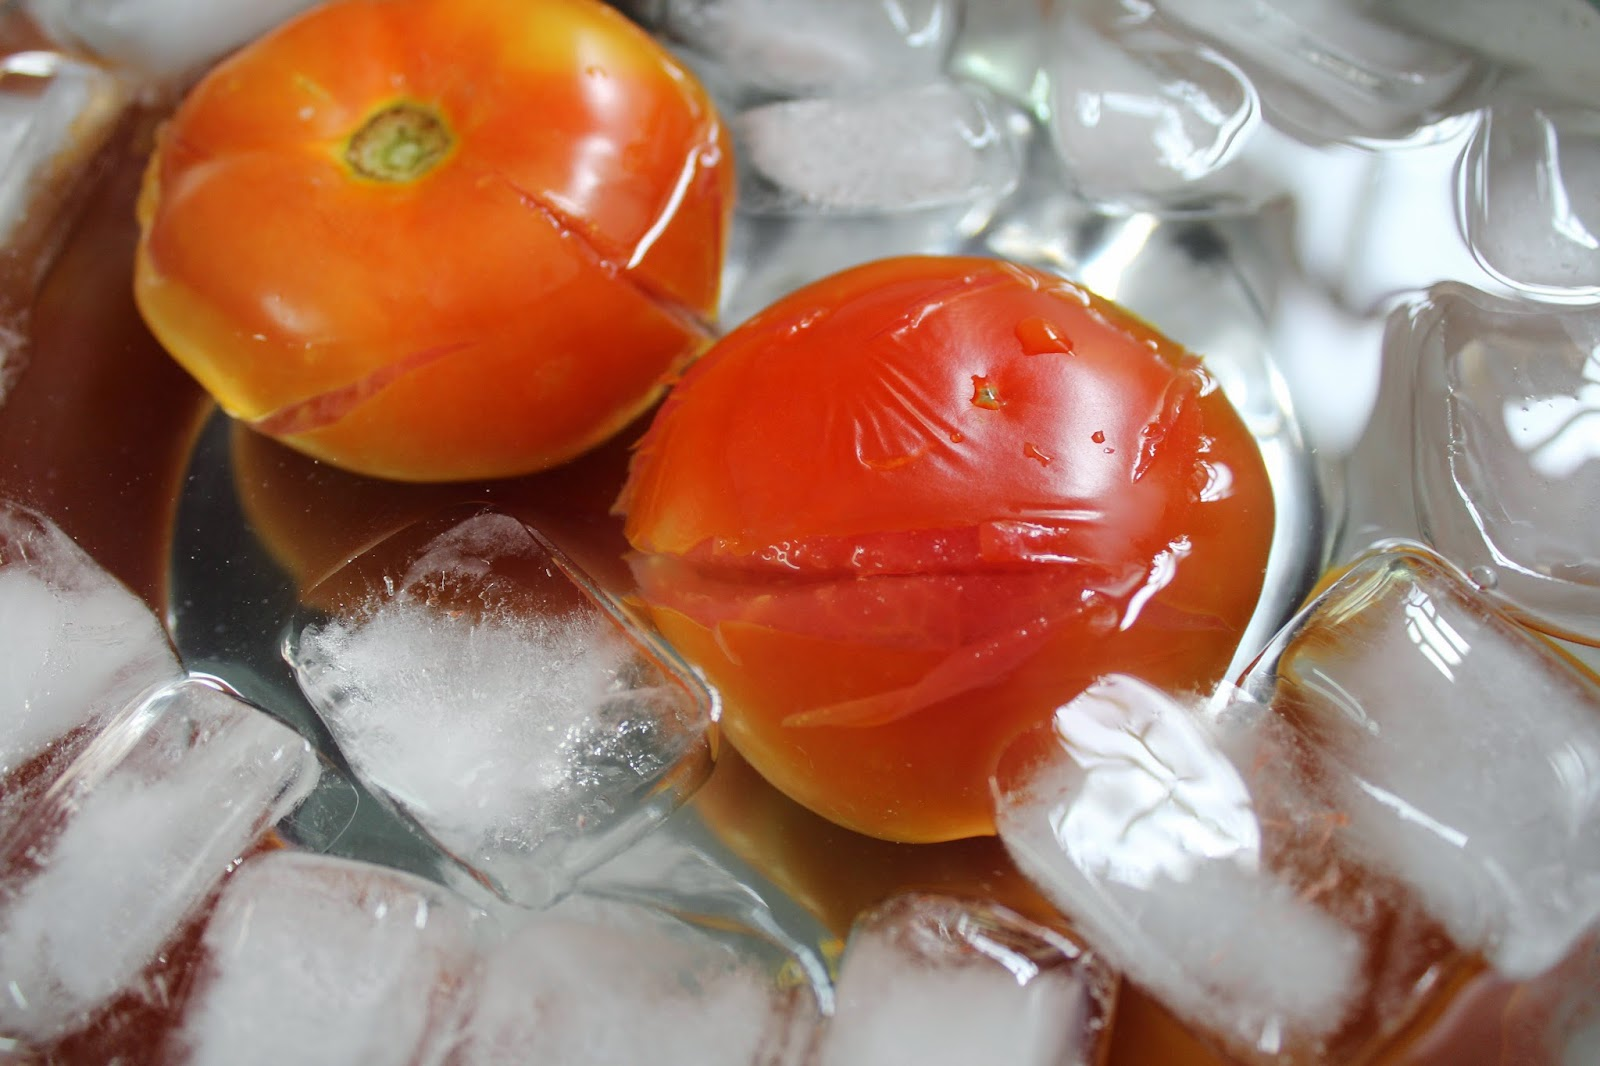 Tomato icebath